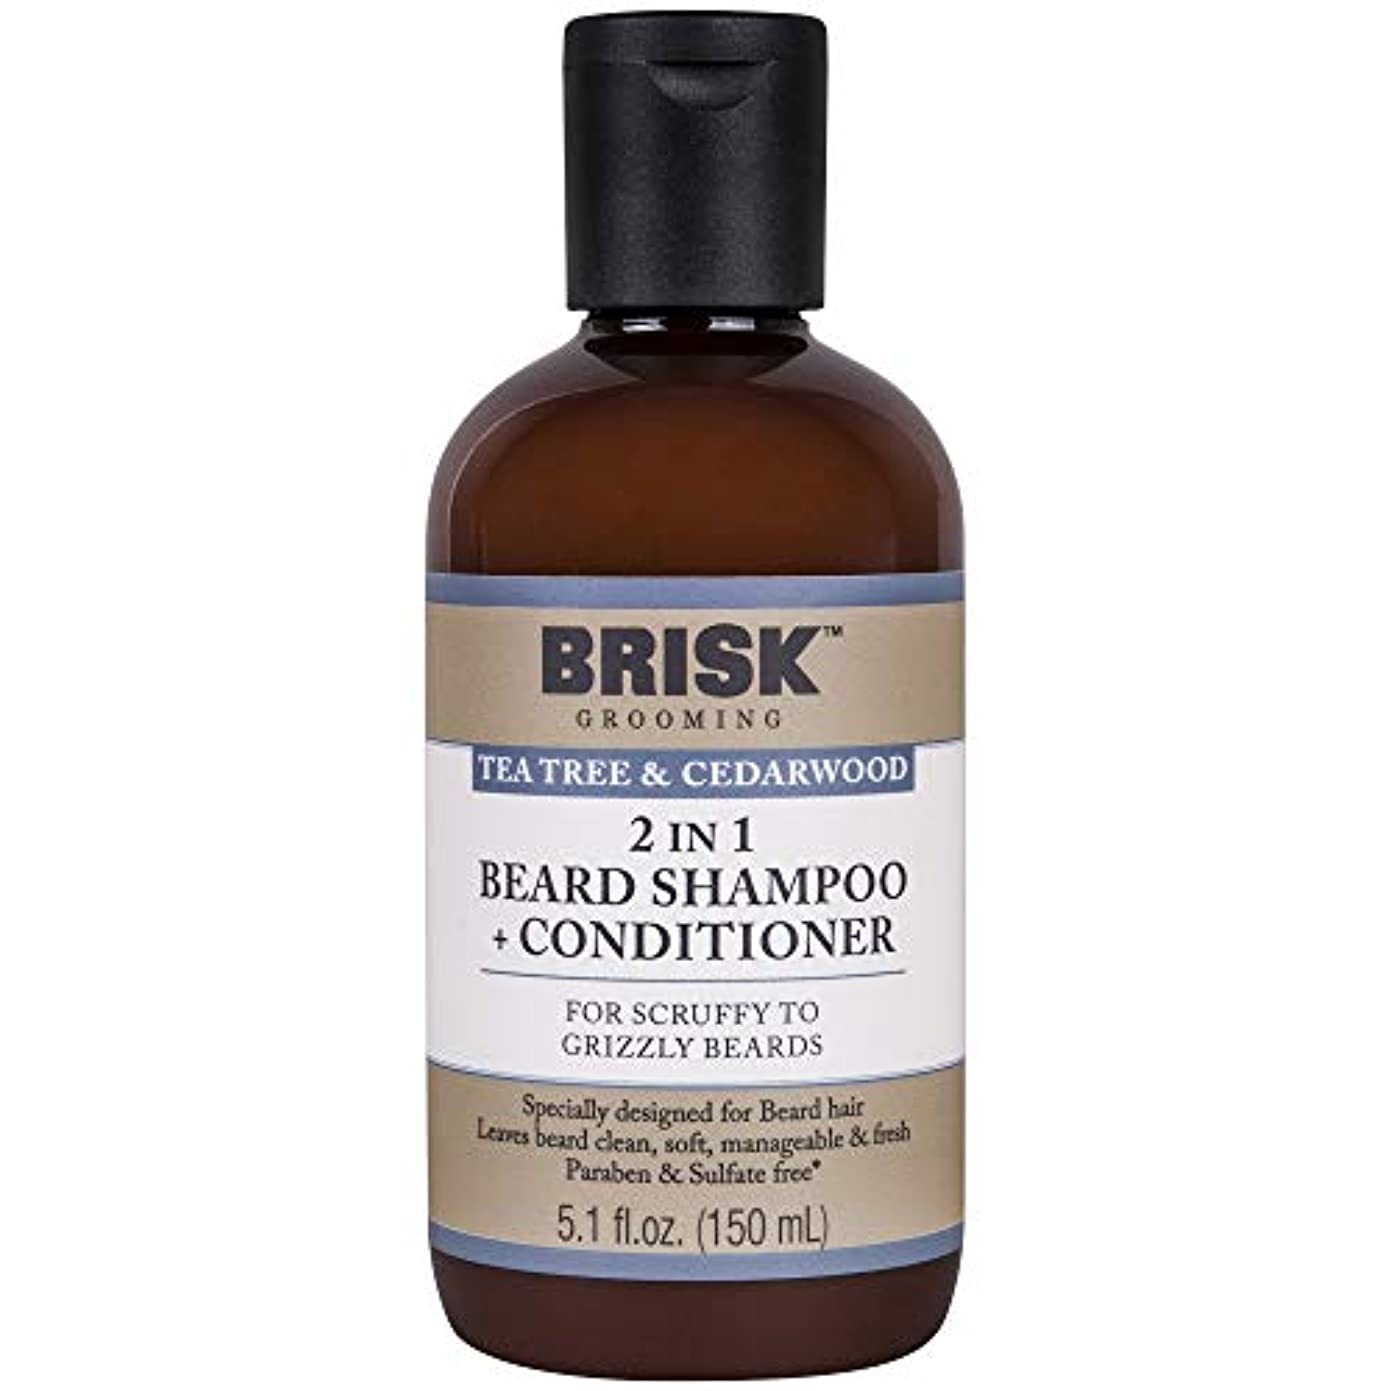 Brisk Grooming 、ティーツリー&シダーウッドビアードシャンプー、ナチュラル&メンズのエッセンシャルオイルでは5.1オンスボトルクレンジング&コンディショニングシャンプービアードはグルーミング、パラベン&硫酸塩フリー